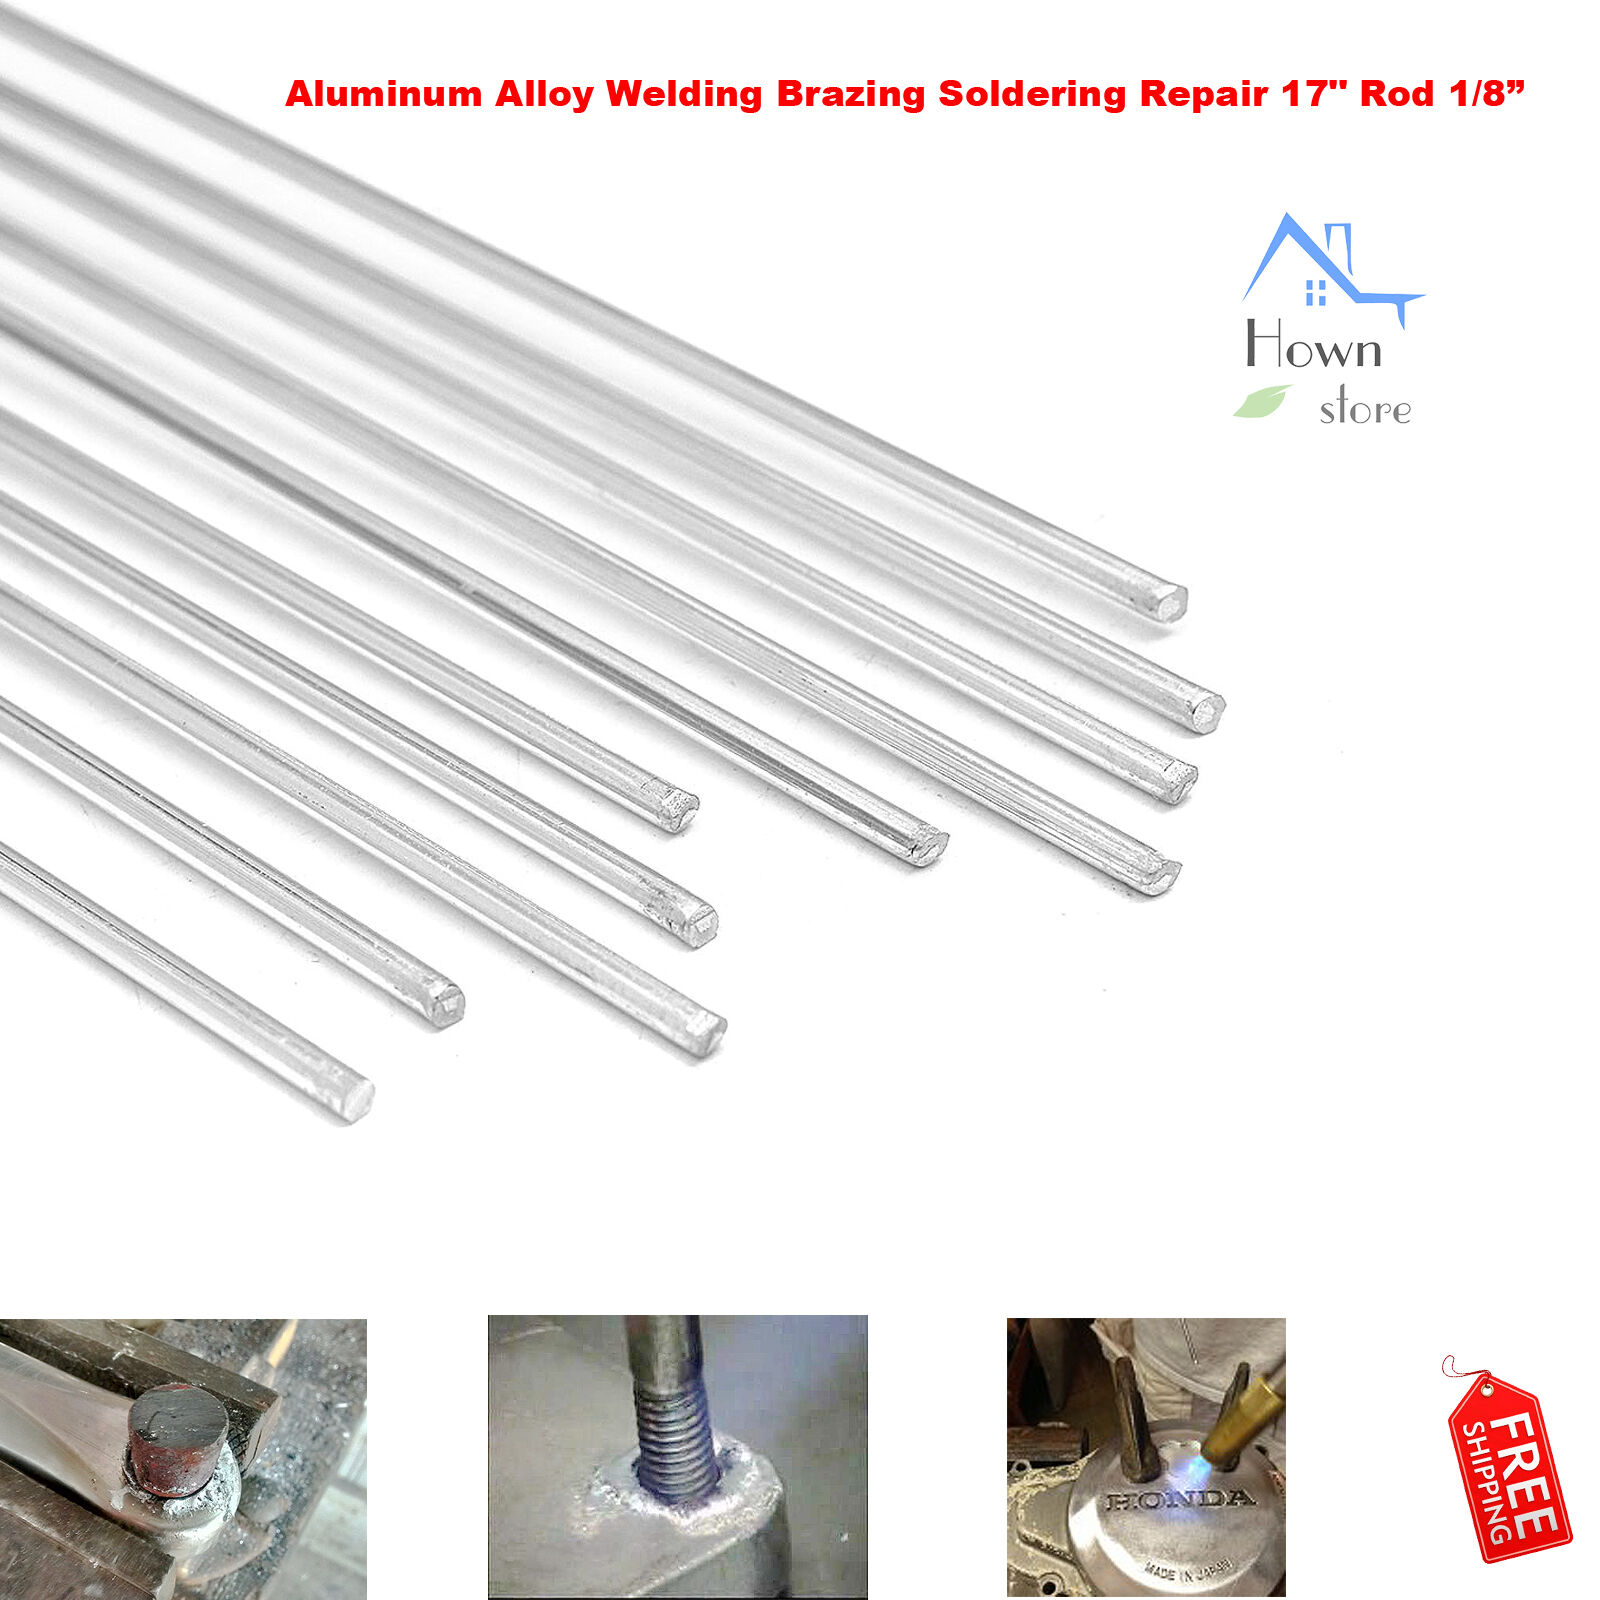 10pcs 450mm Aluminum Alloy Silver Welding Rods Tools For Cracks Polish Paint